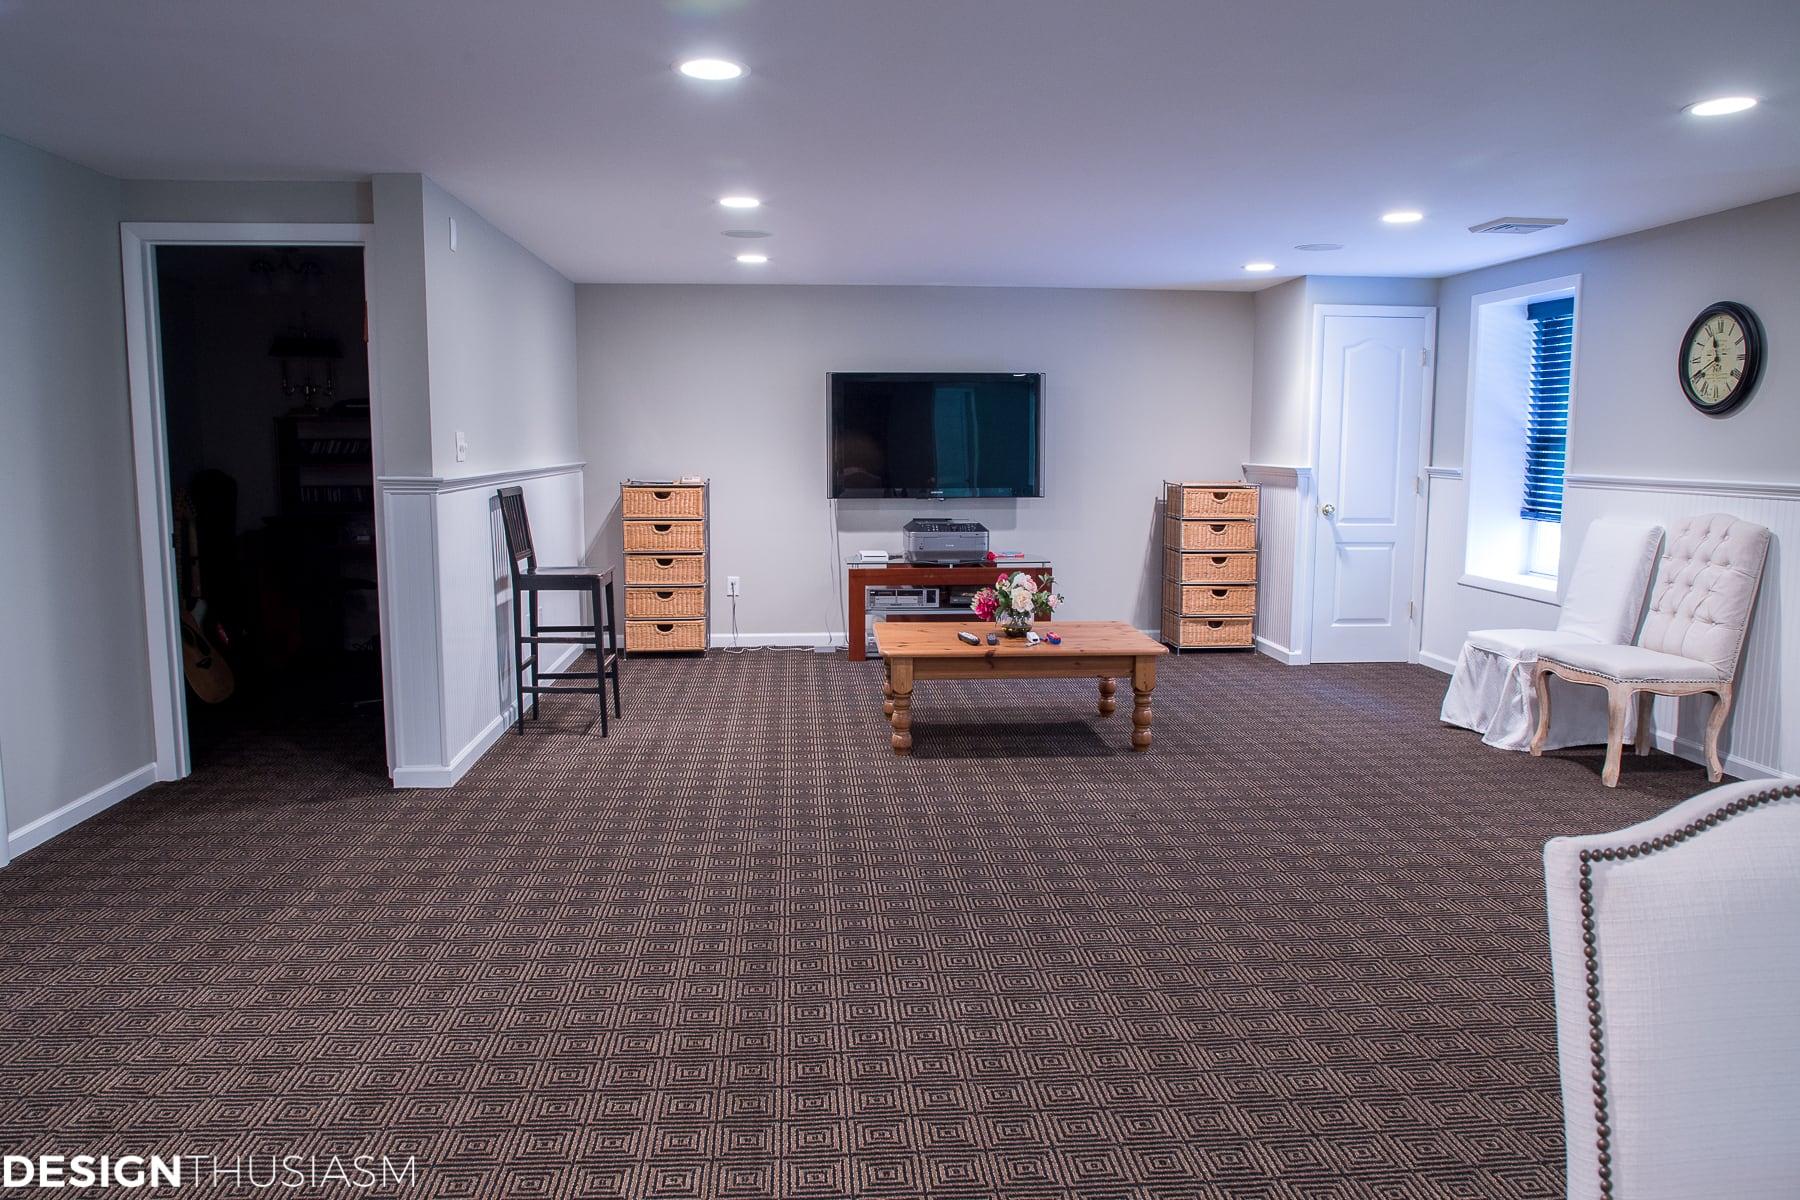 Finished Basement Ideas: 3 Amazing Basement Floor Plans